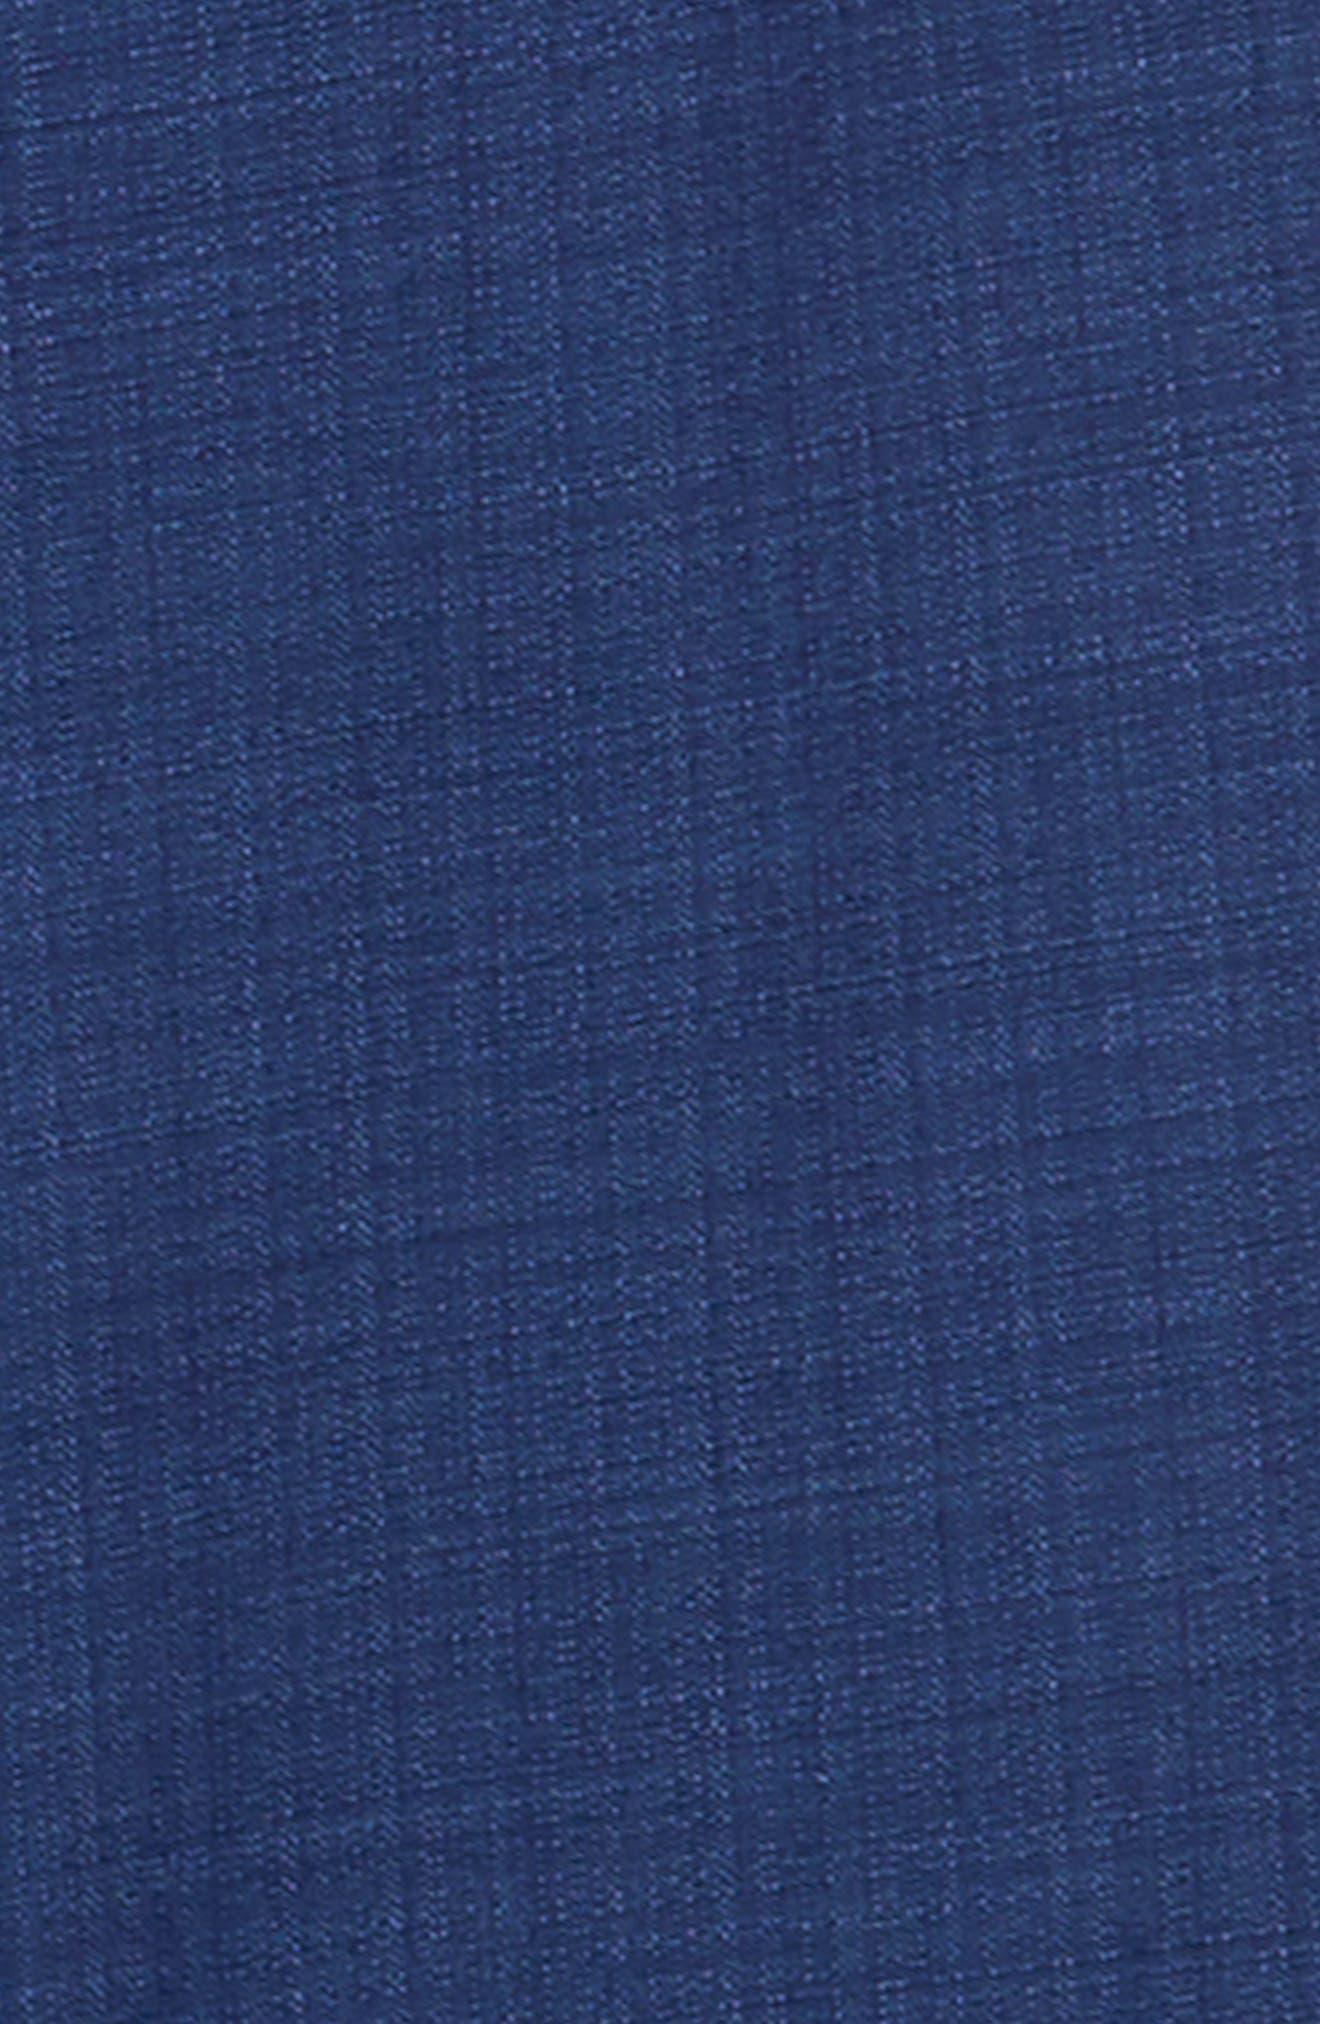 Textured Suit,                             Alternate thumbnail 2, color,                             Blue/ Navy